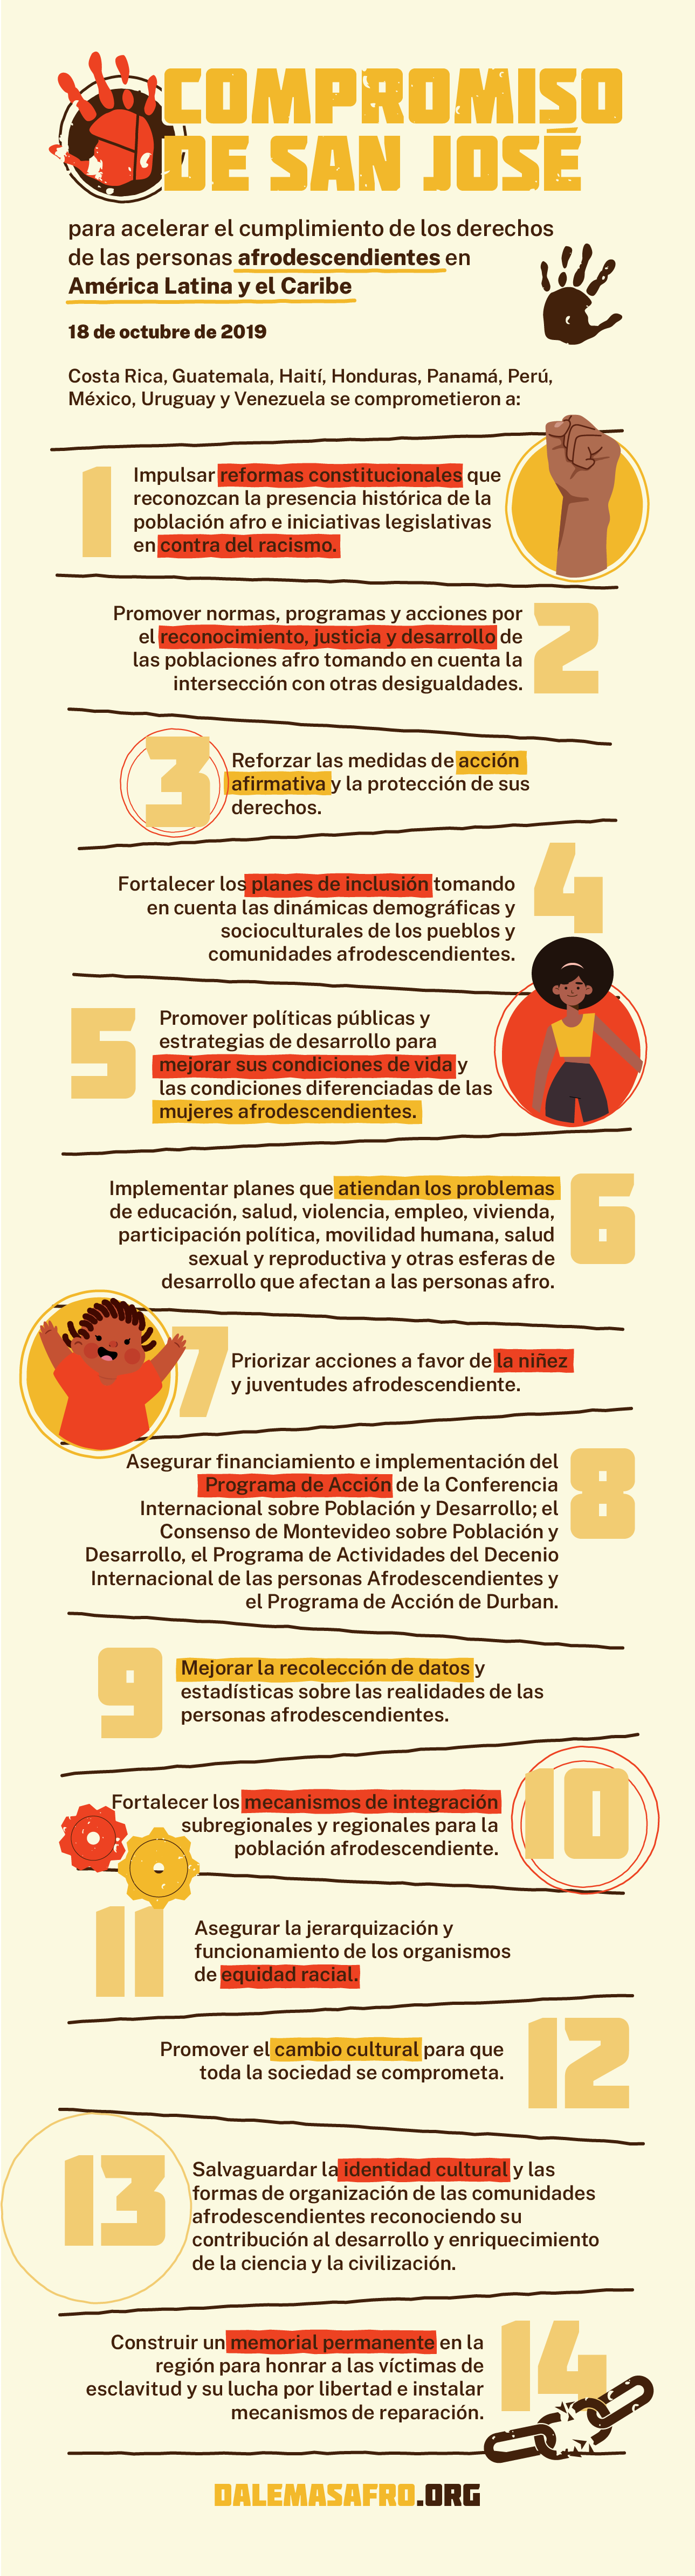 Lista de Compromisos de San José 2021